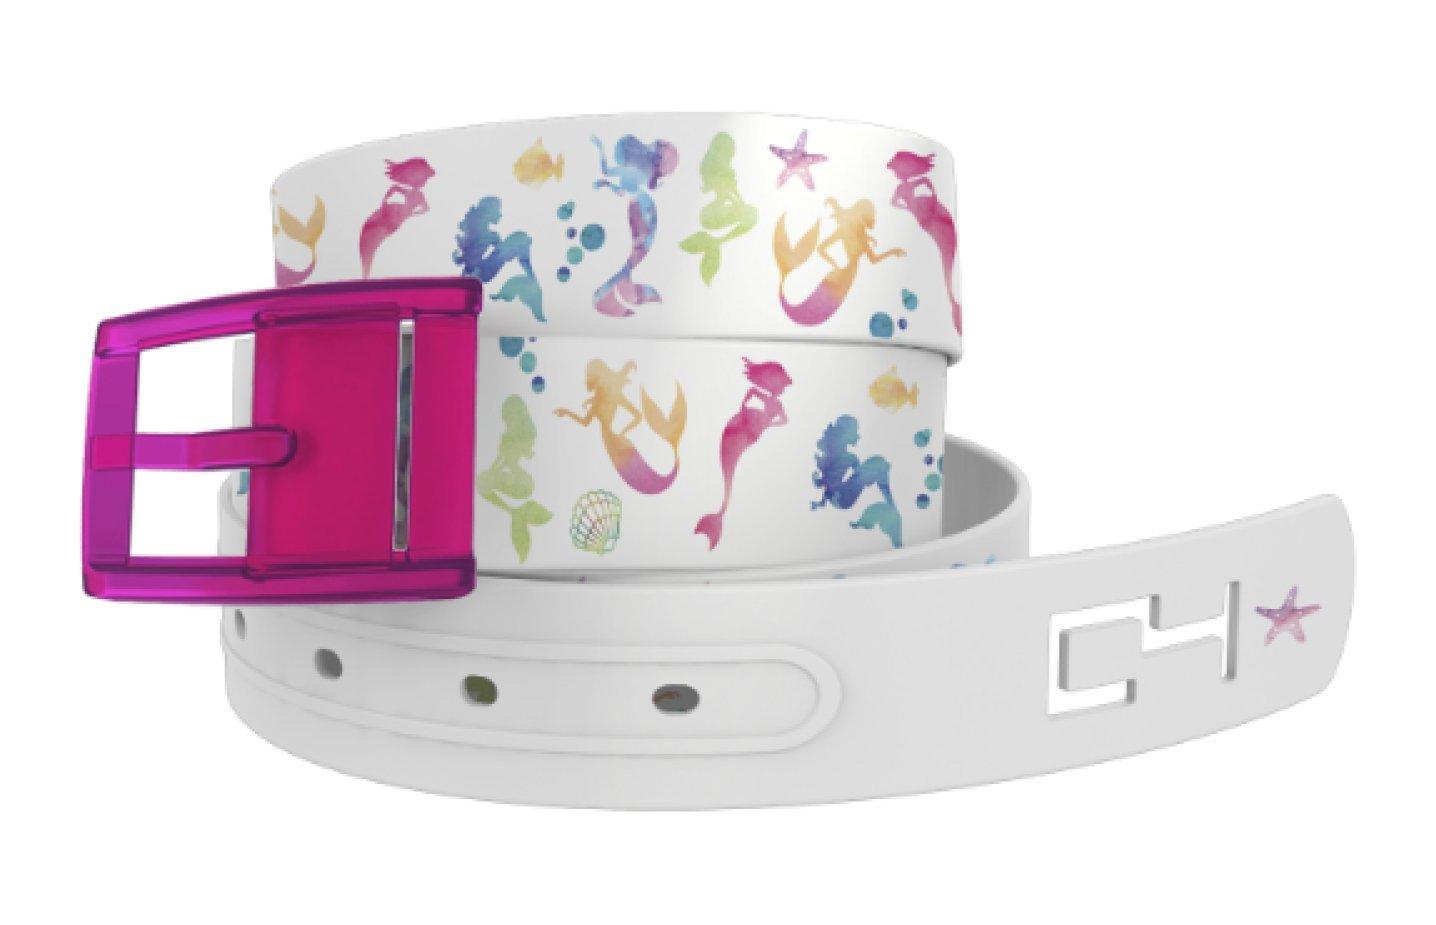 C4 Mermaids with Hot Pink Buckle - Fashion Waist Belt for Women & Men by C4 Belts (Image #1)